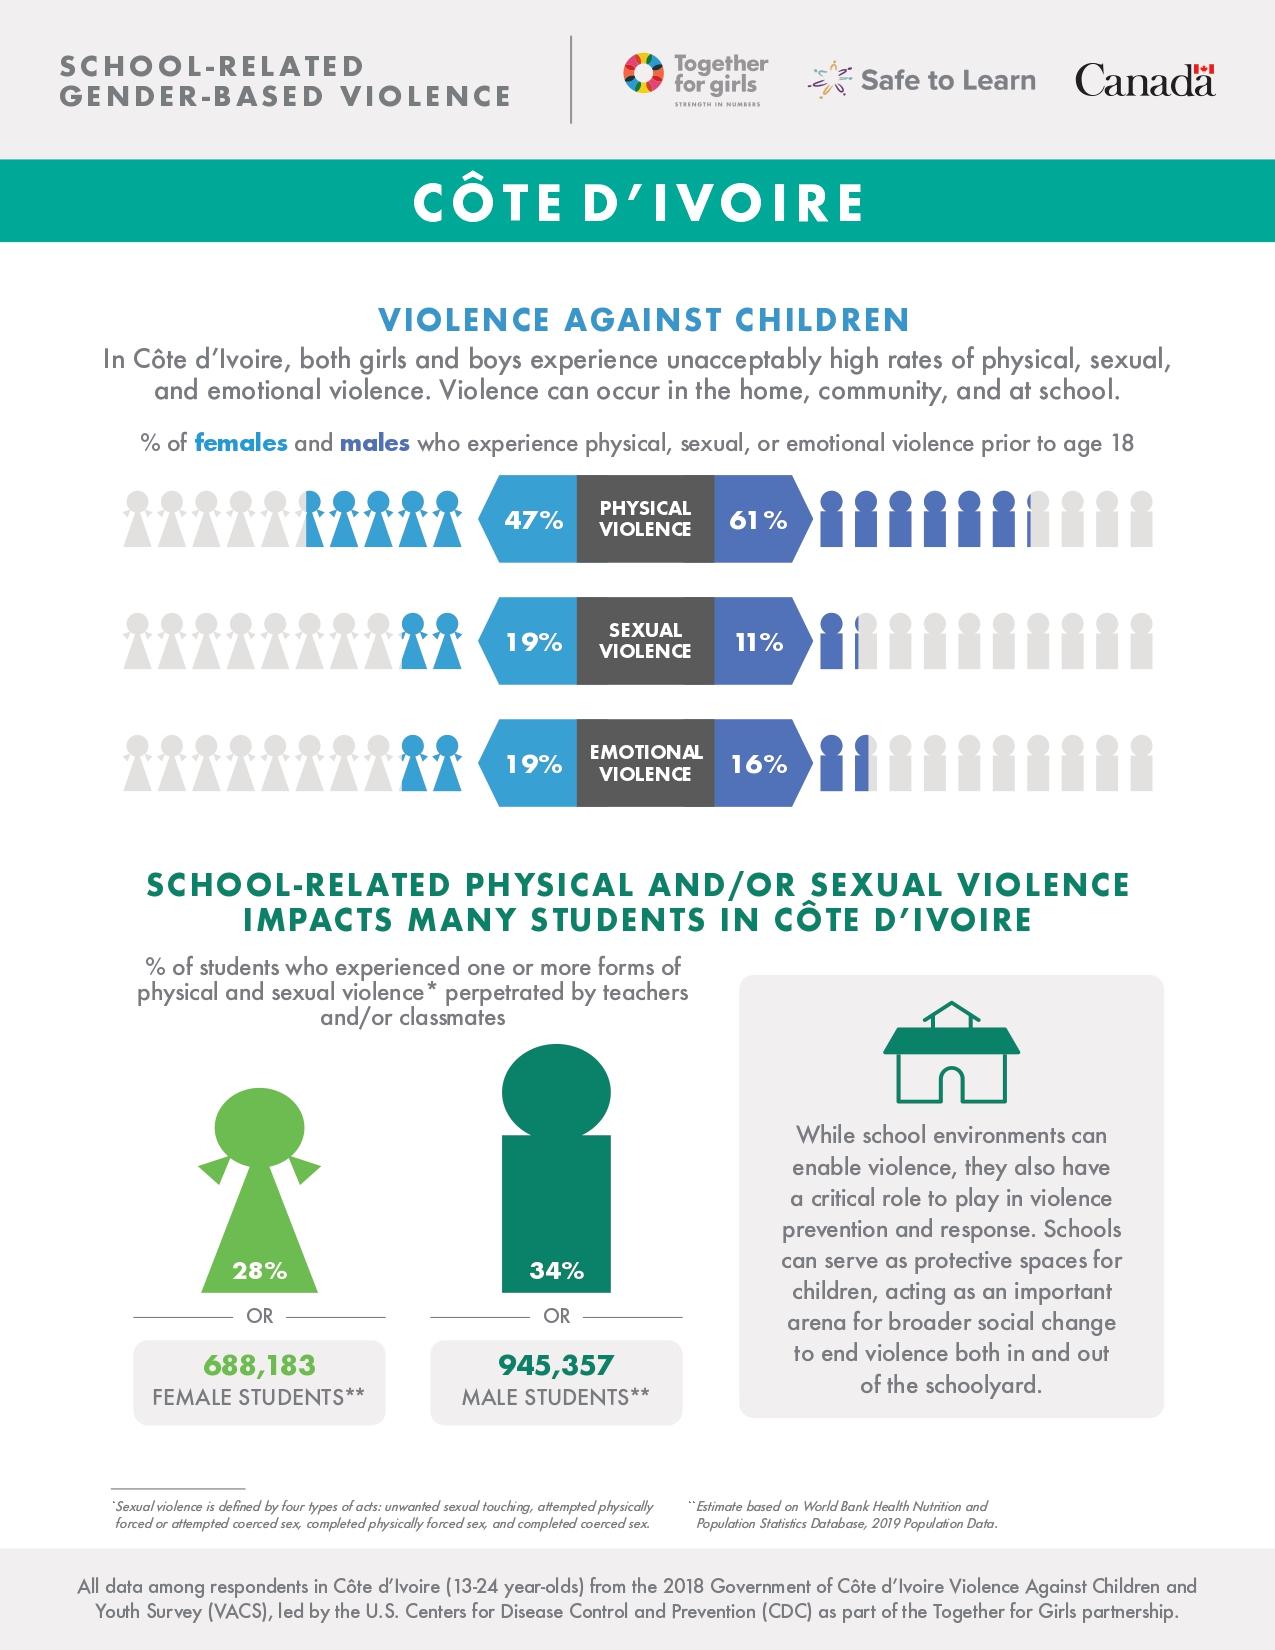 Côte d'Ivoire fact sheet: School-Related Gender-Based Violence